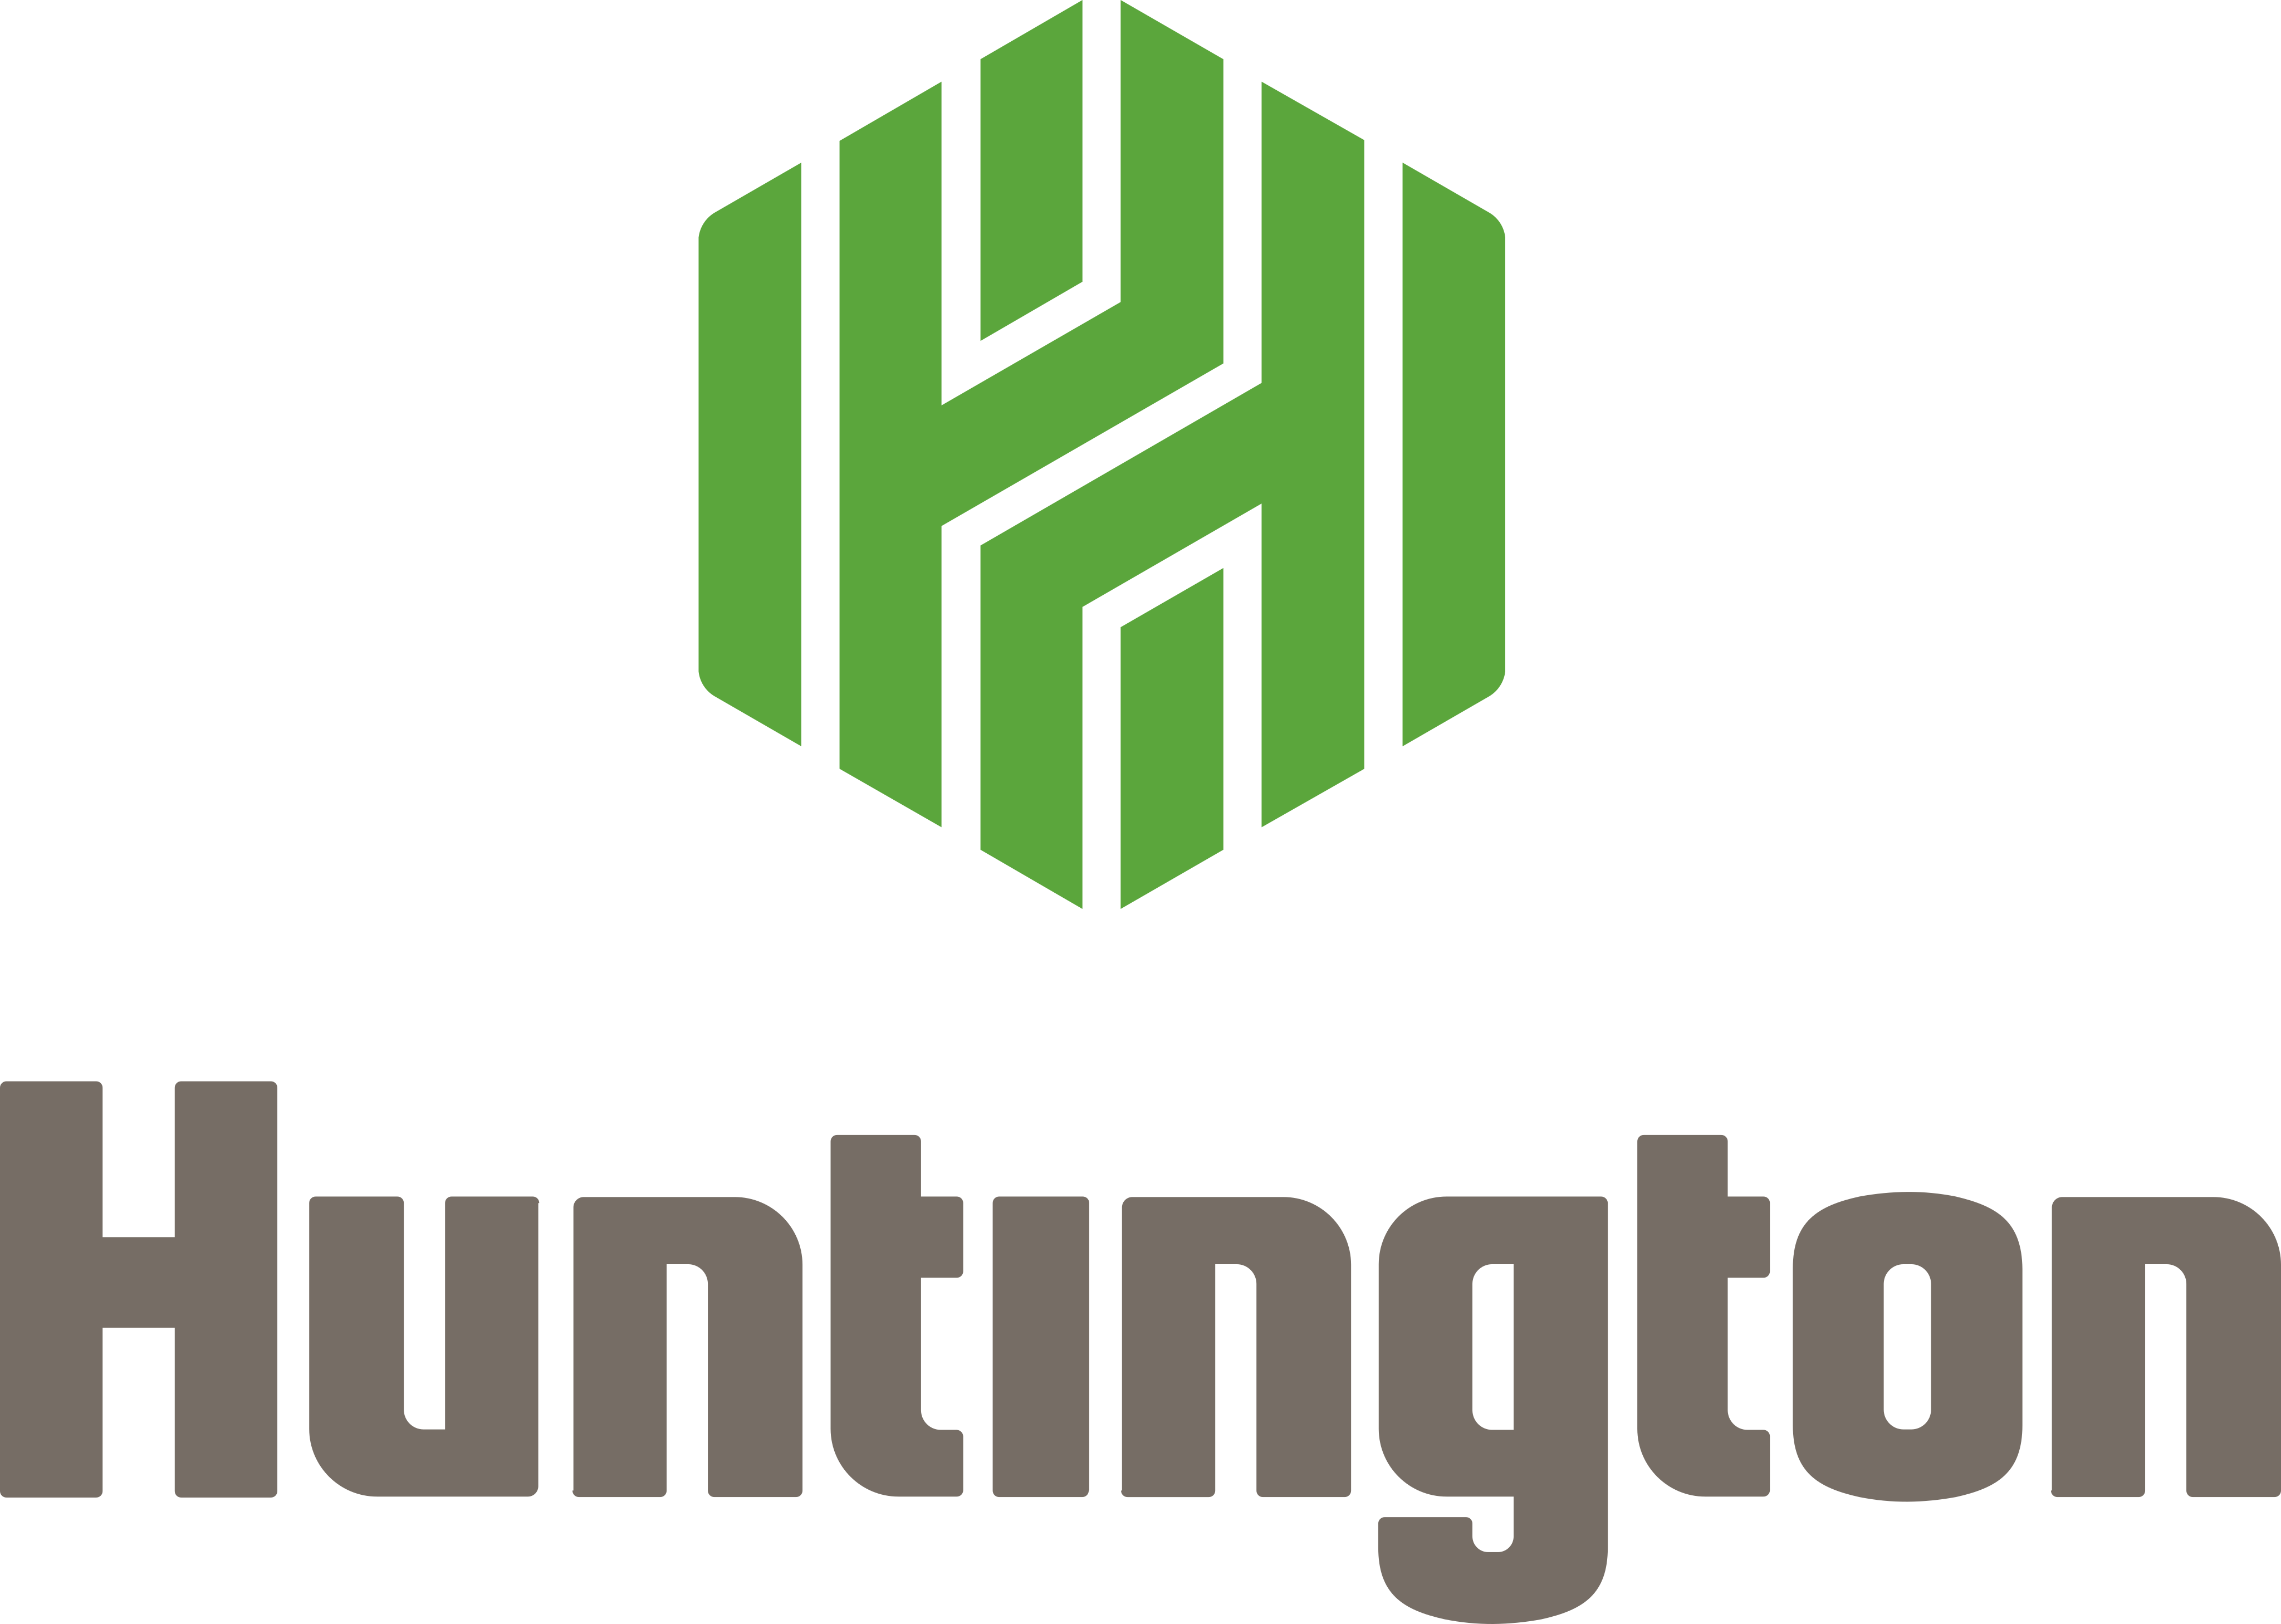 huntington bank logo 1 - Huntington Bank Logo